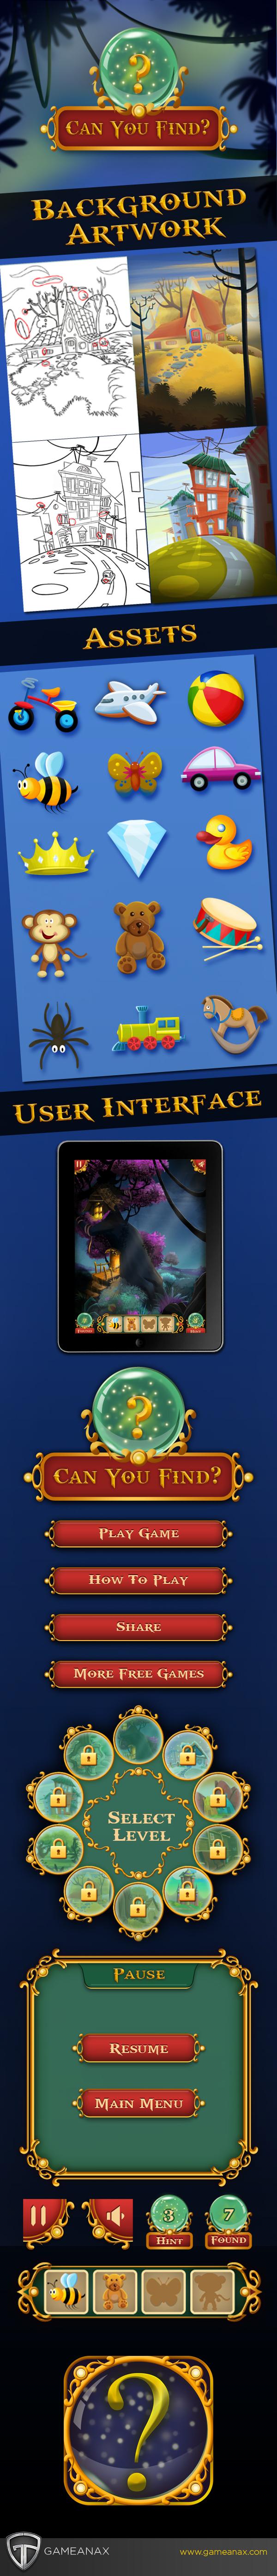 mobile gaming Gaming Games iphone iPad